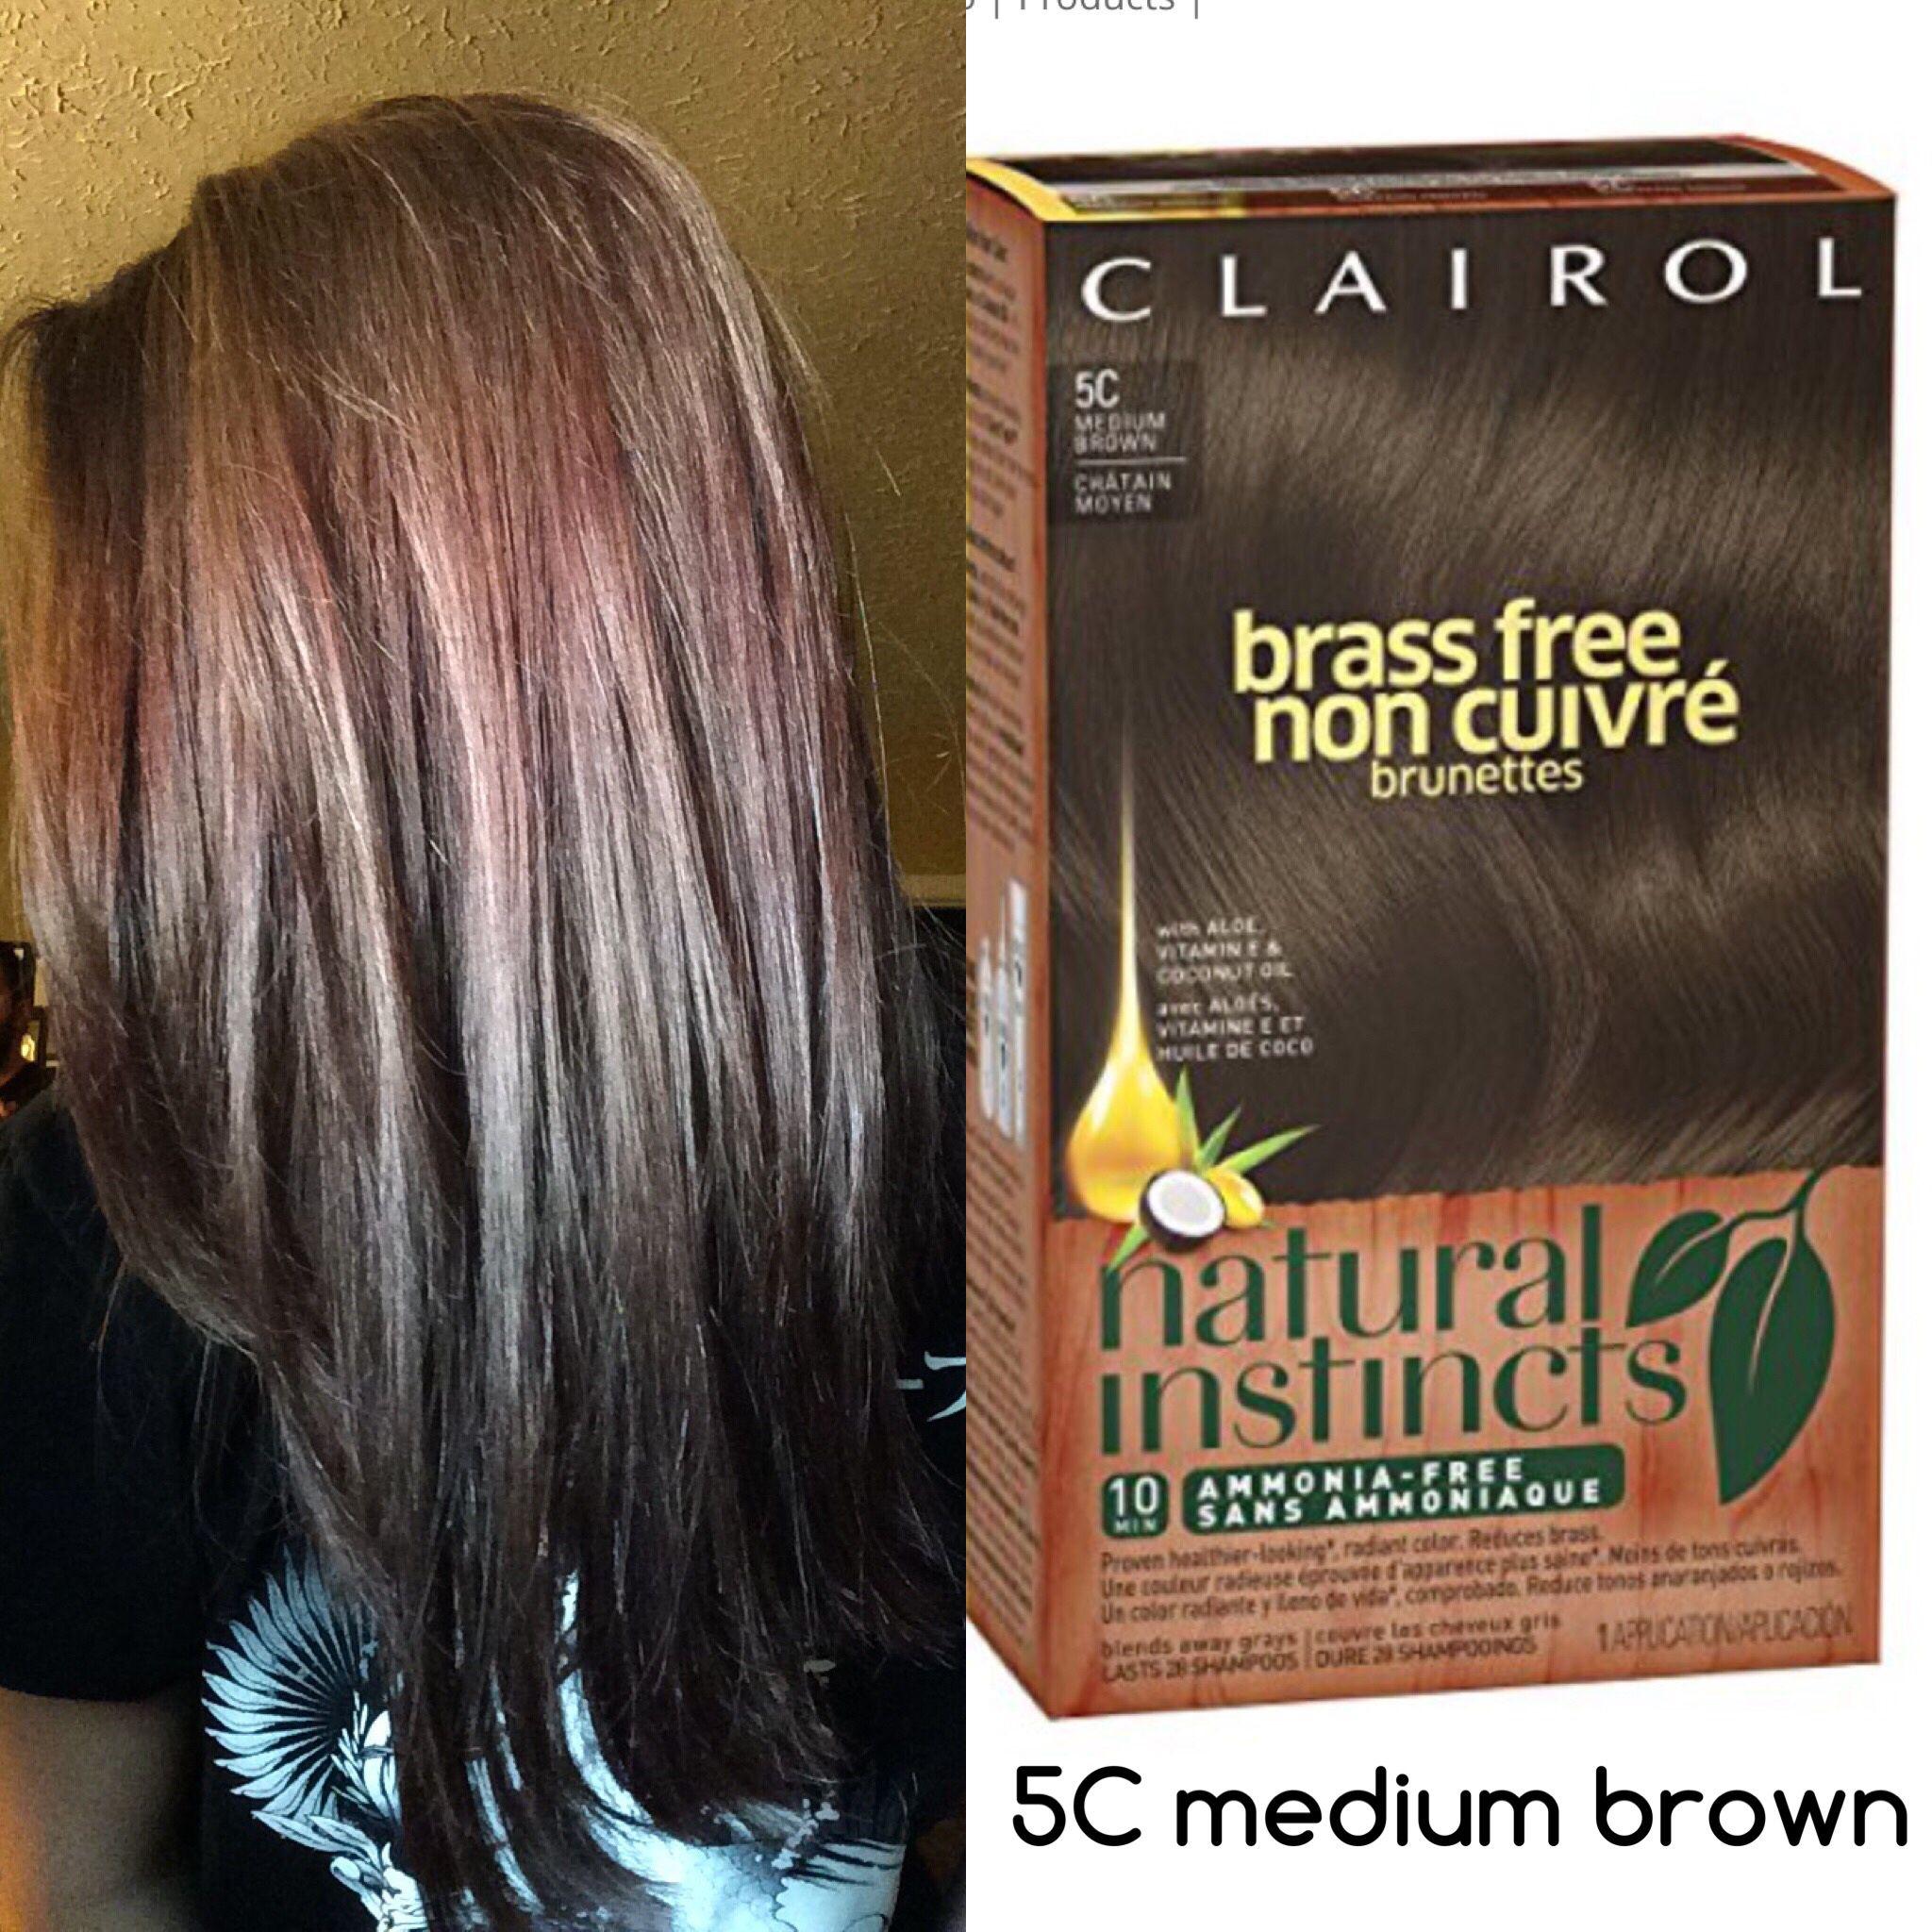 Clairol Natural Instincts 5c Medium Brown Hair Color